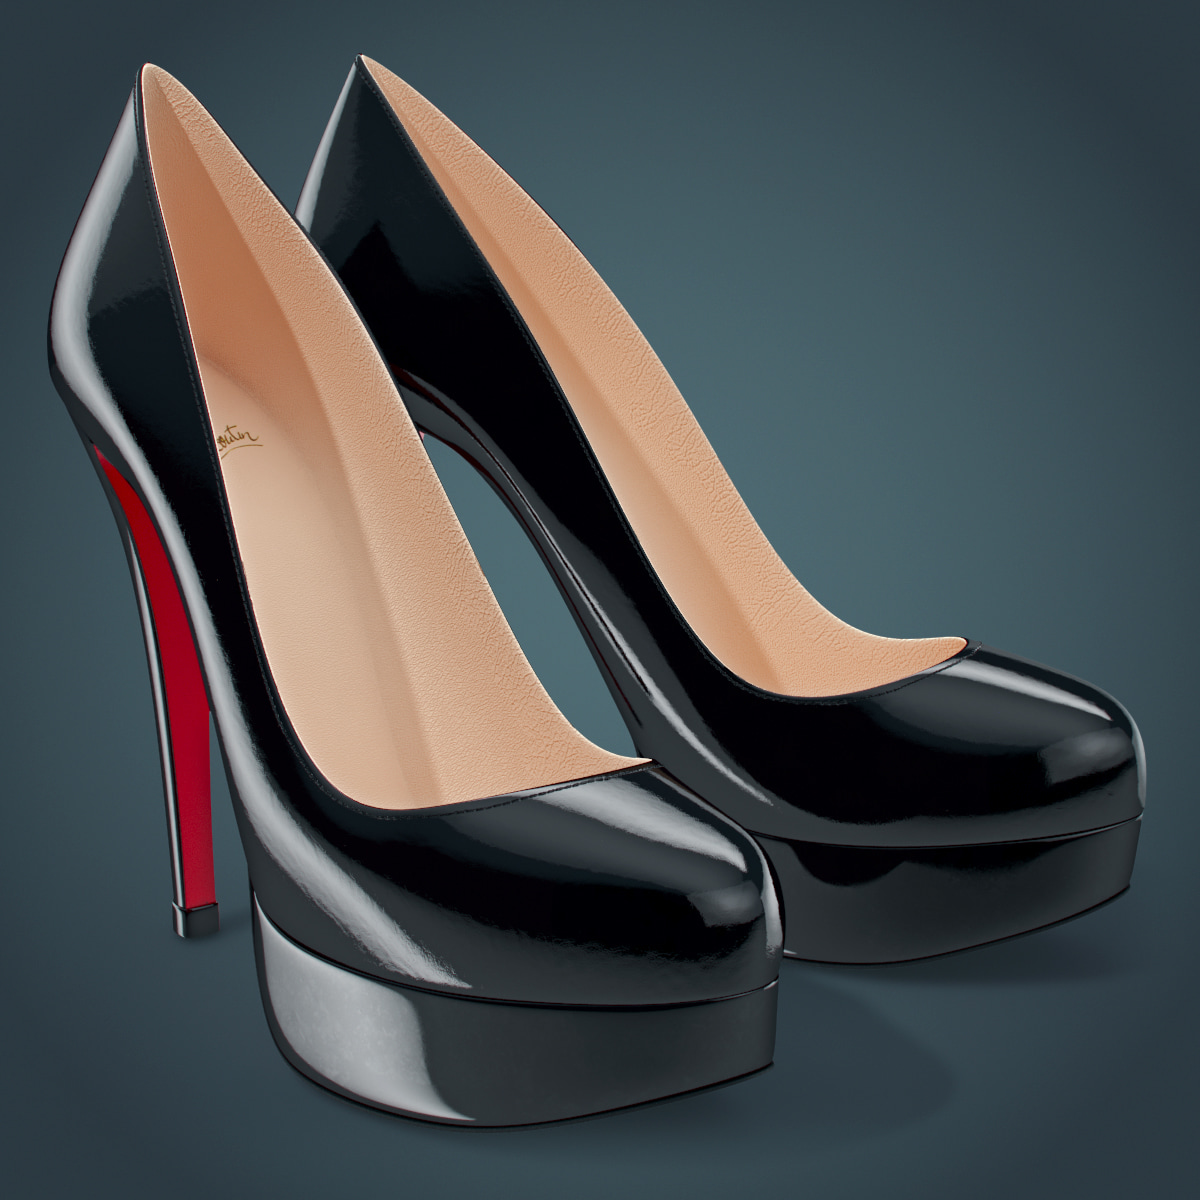 3d shoes louboutin bianca